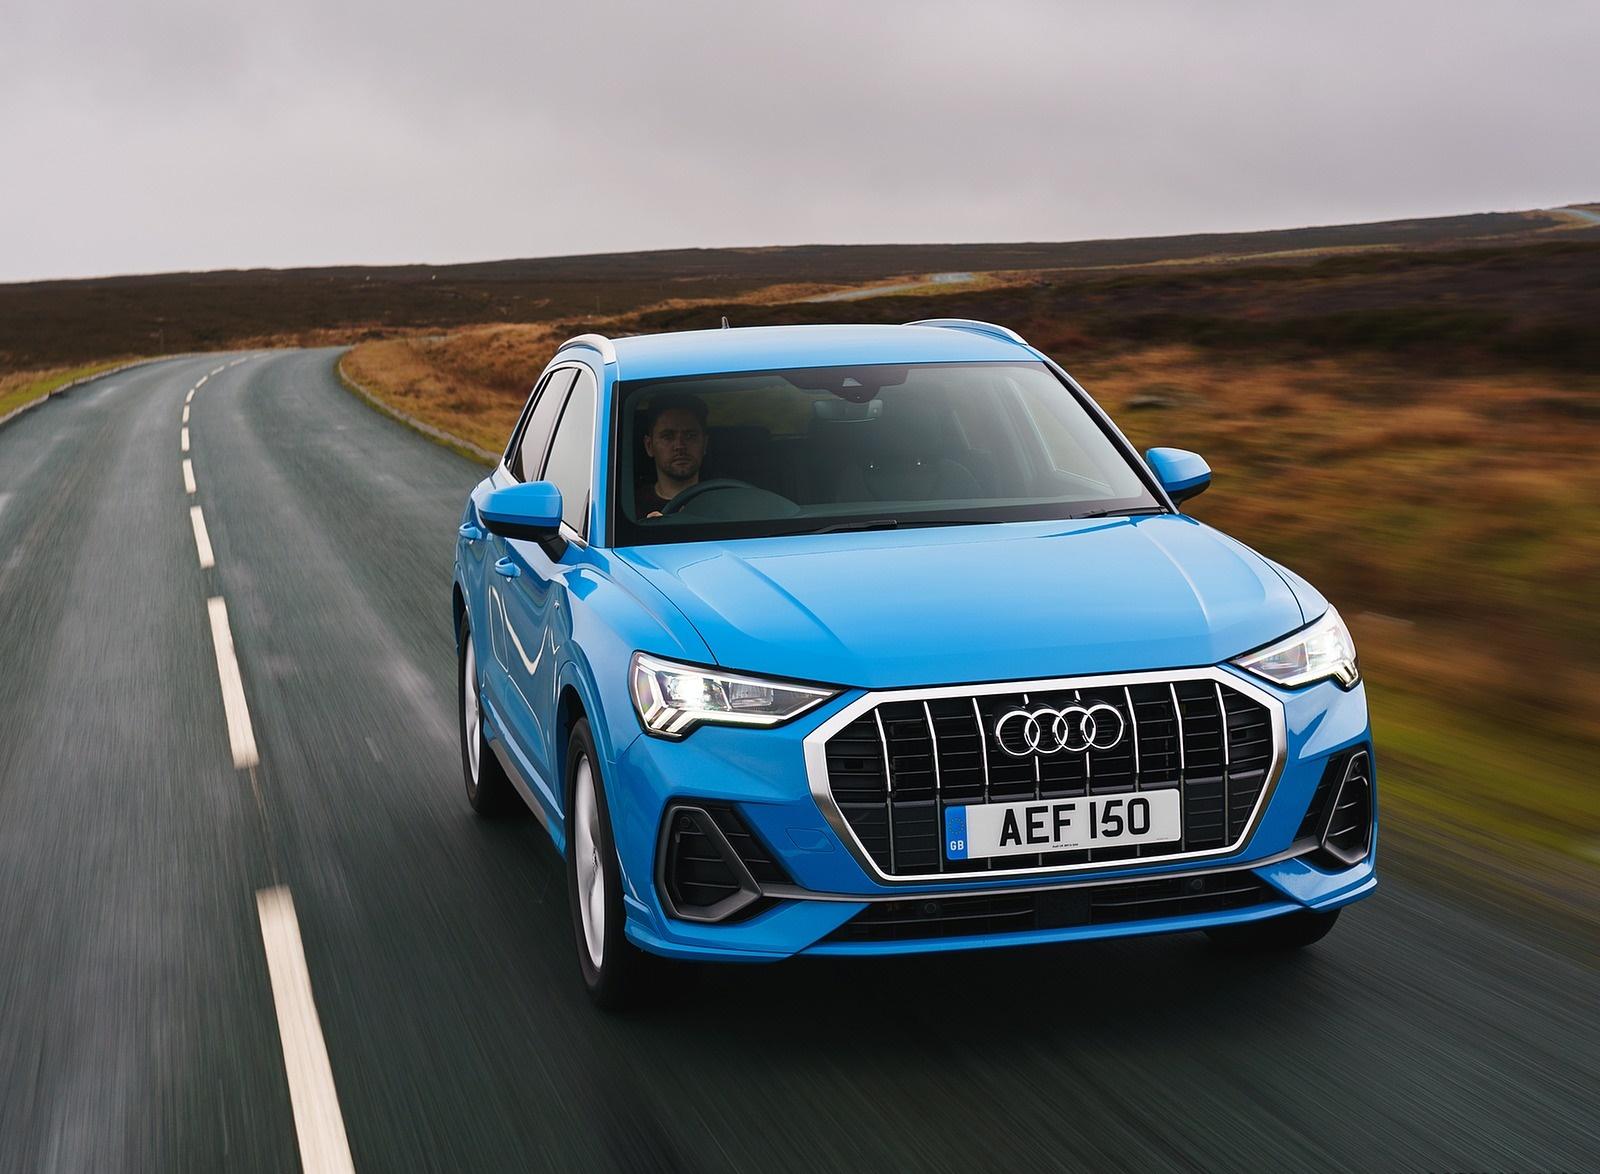 2019 Audi Q3 35 TFSI (UK-Spec) Front Wallpaper (12)